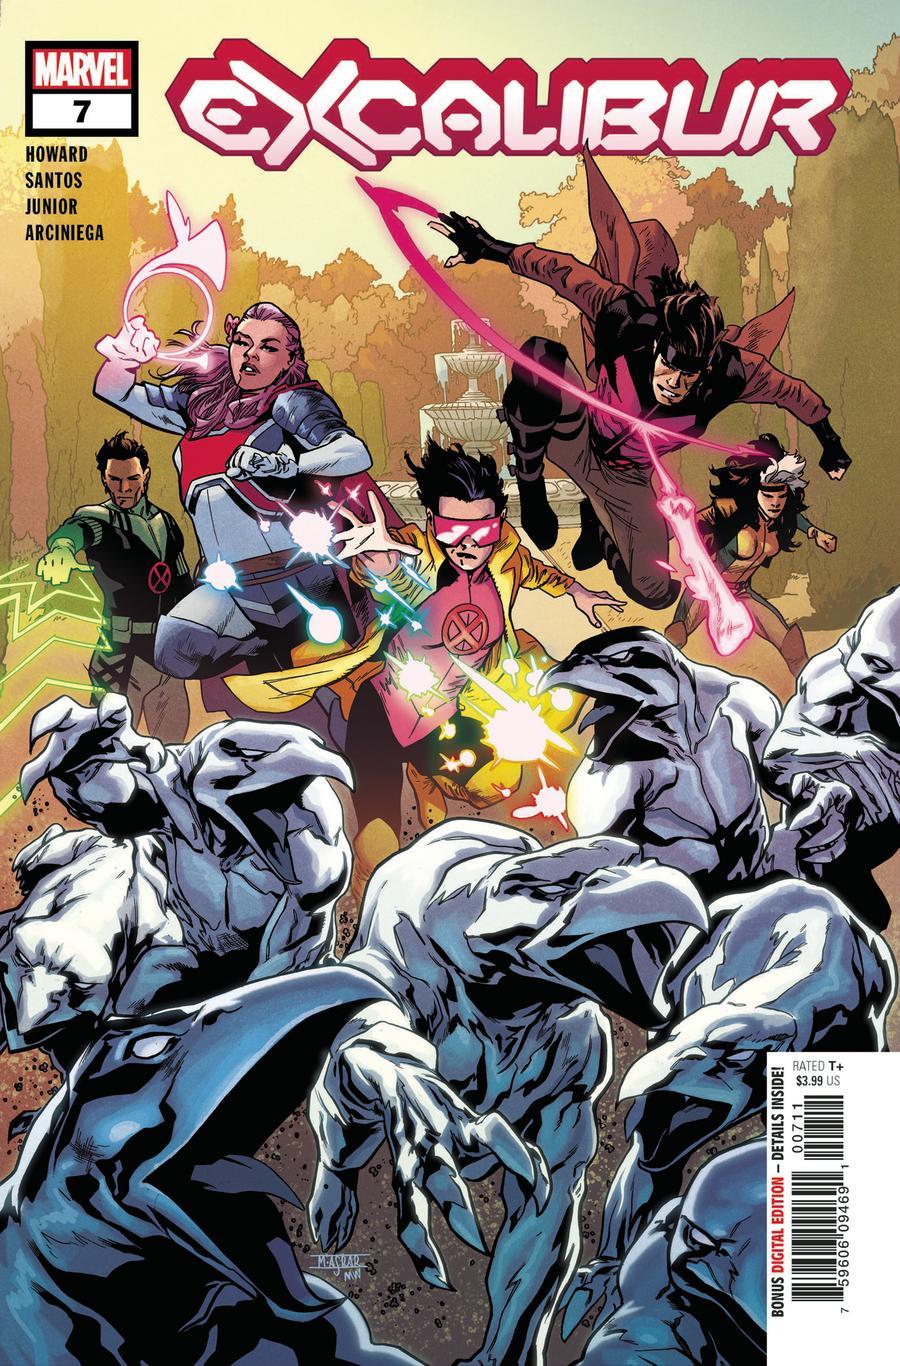 Excalibur Vol 4 #7 Cover A Regular Mahmud Asrar Cover (Dawn Of X Tie-In)